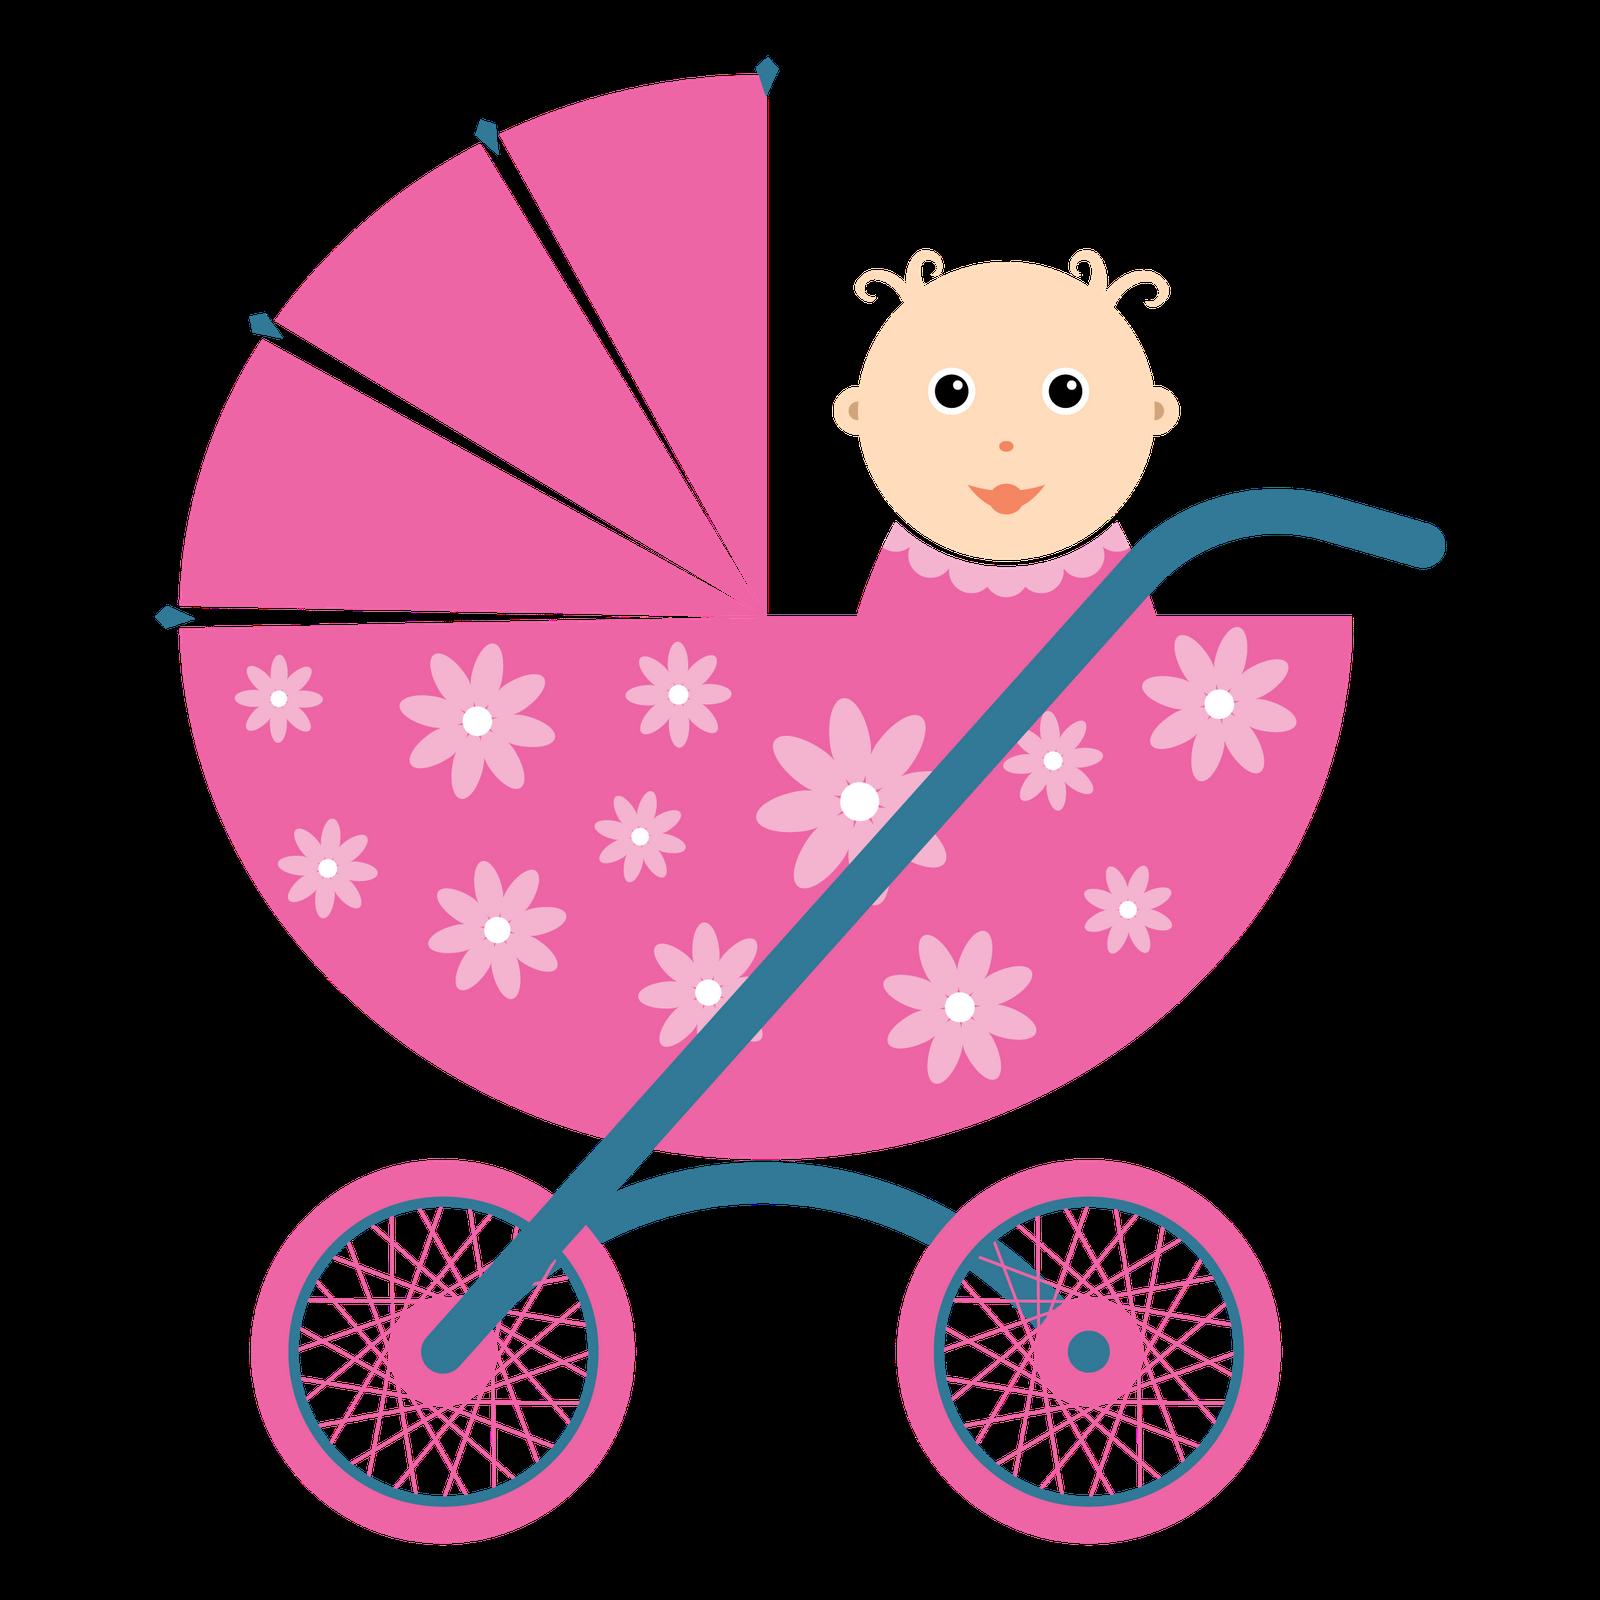 Imagenes baby shower niña png 3 » PNG Image.